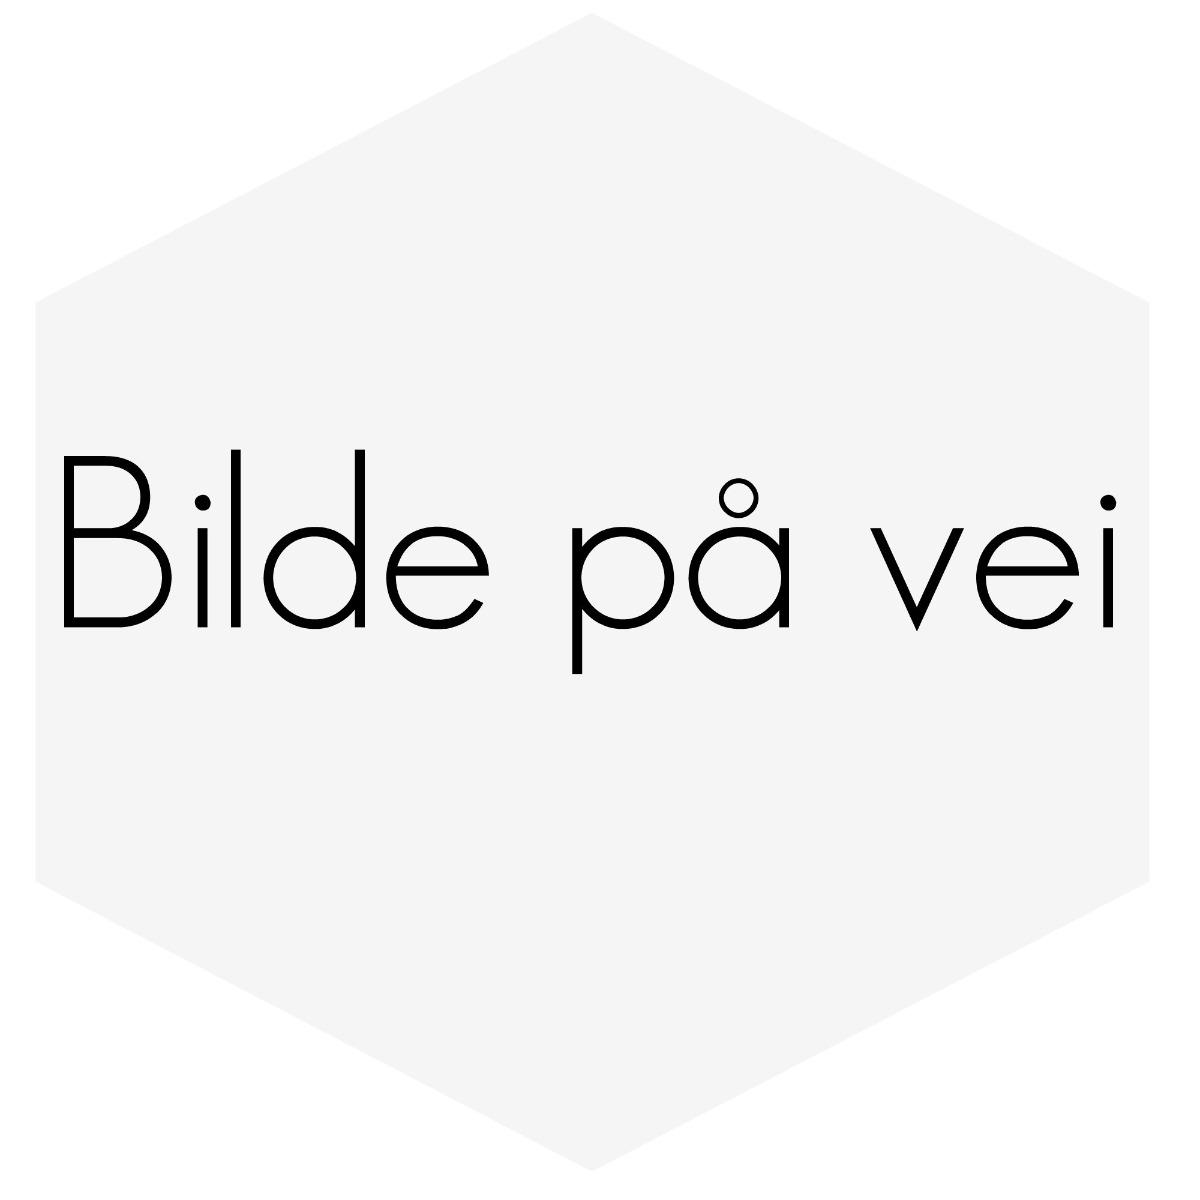 SILIKONSLANGE ARMERT BLÅ 0,15'' (4MM),pris pr meter